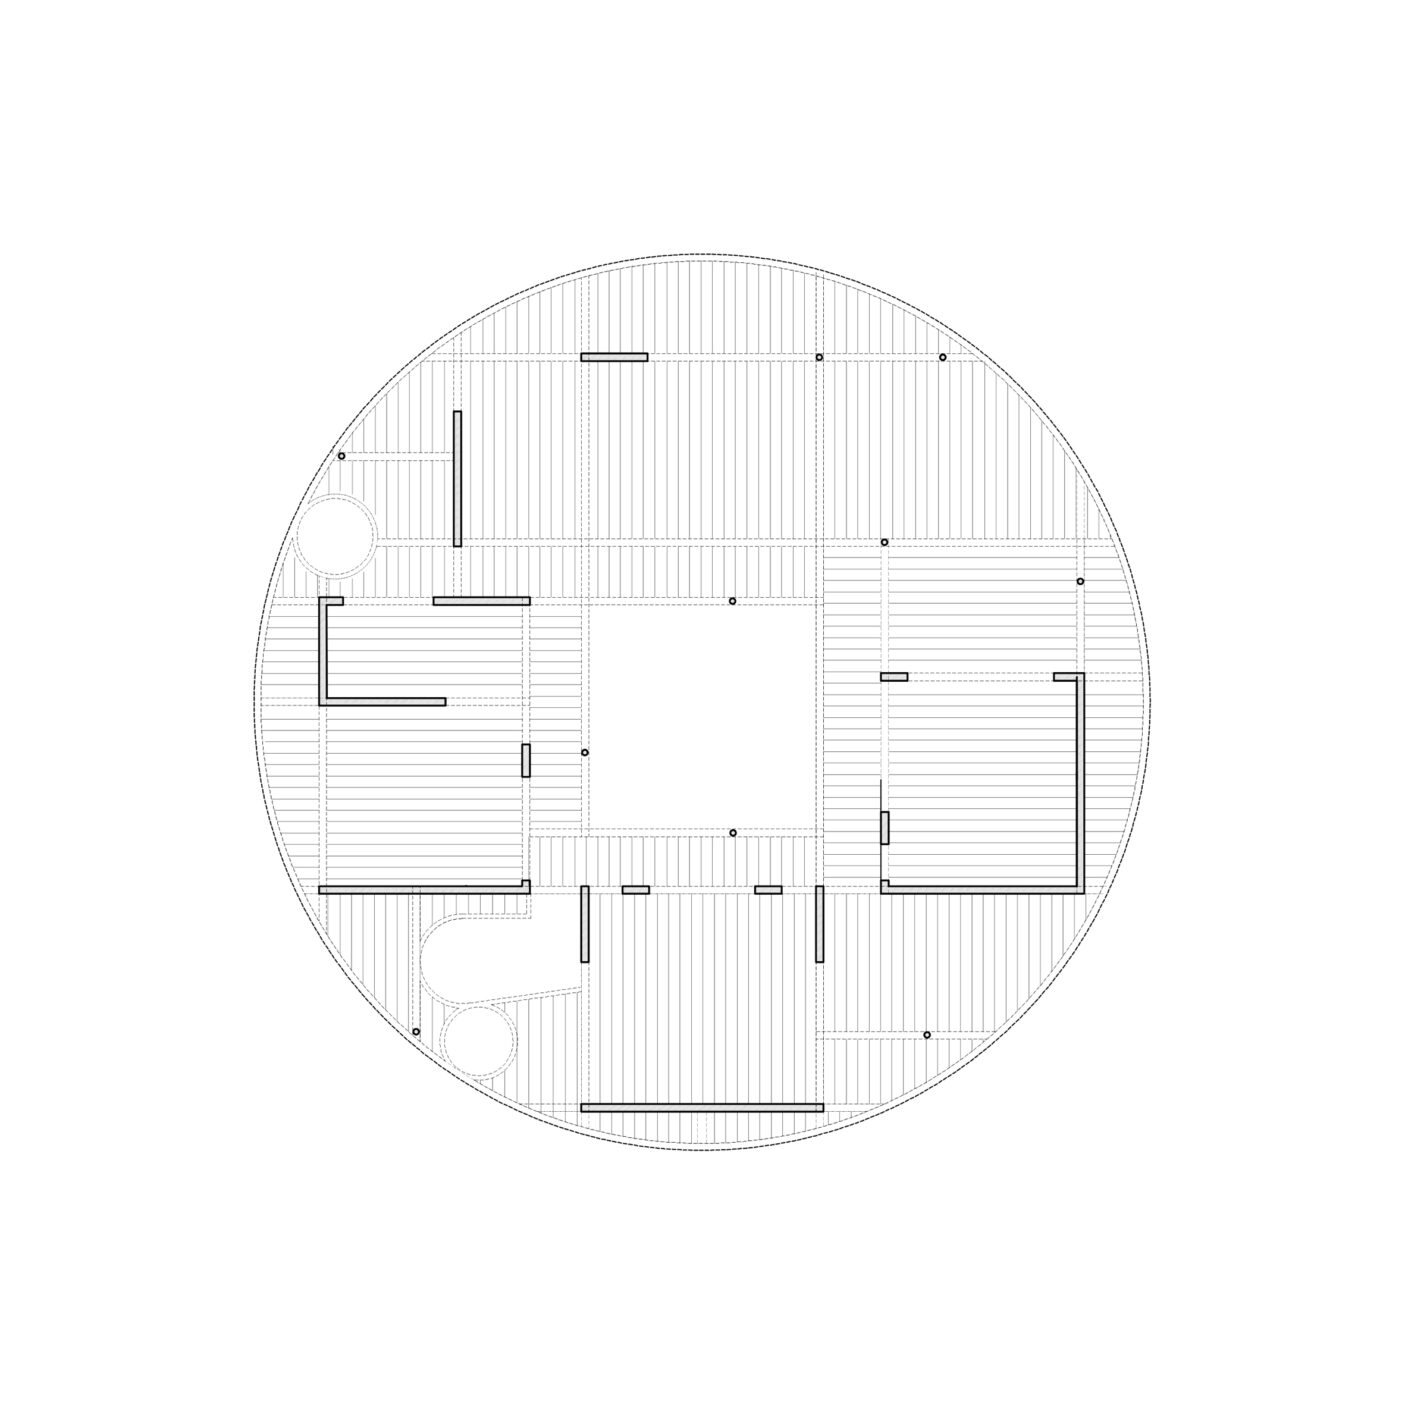 jj-plan-web-2-crop.jpg